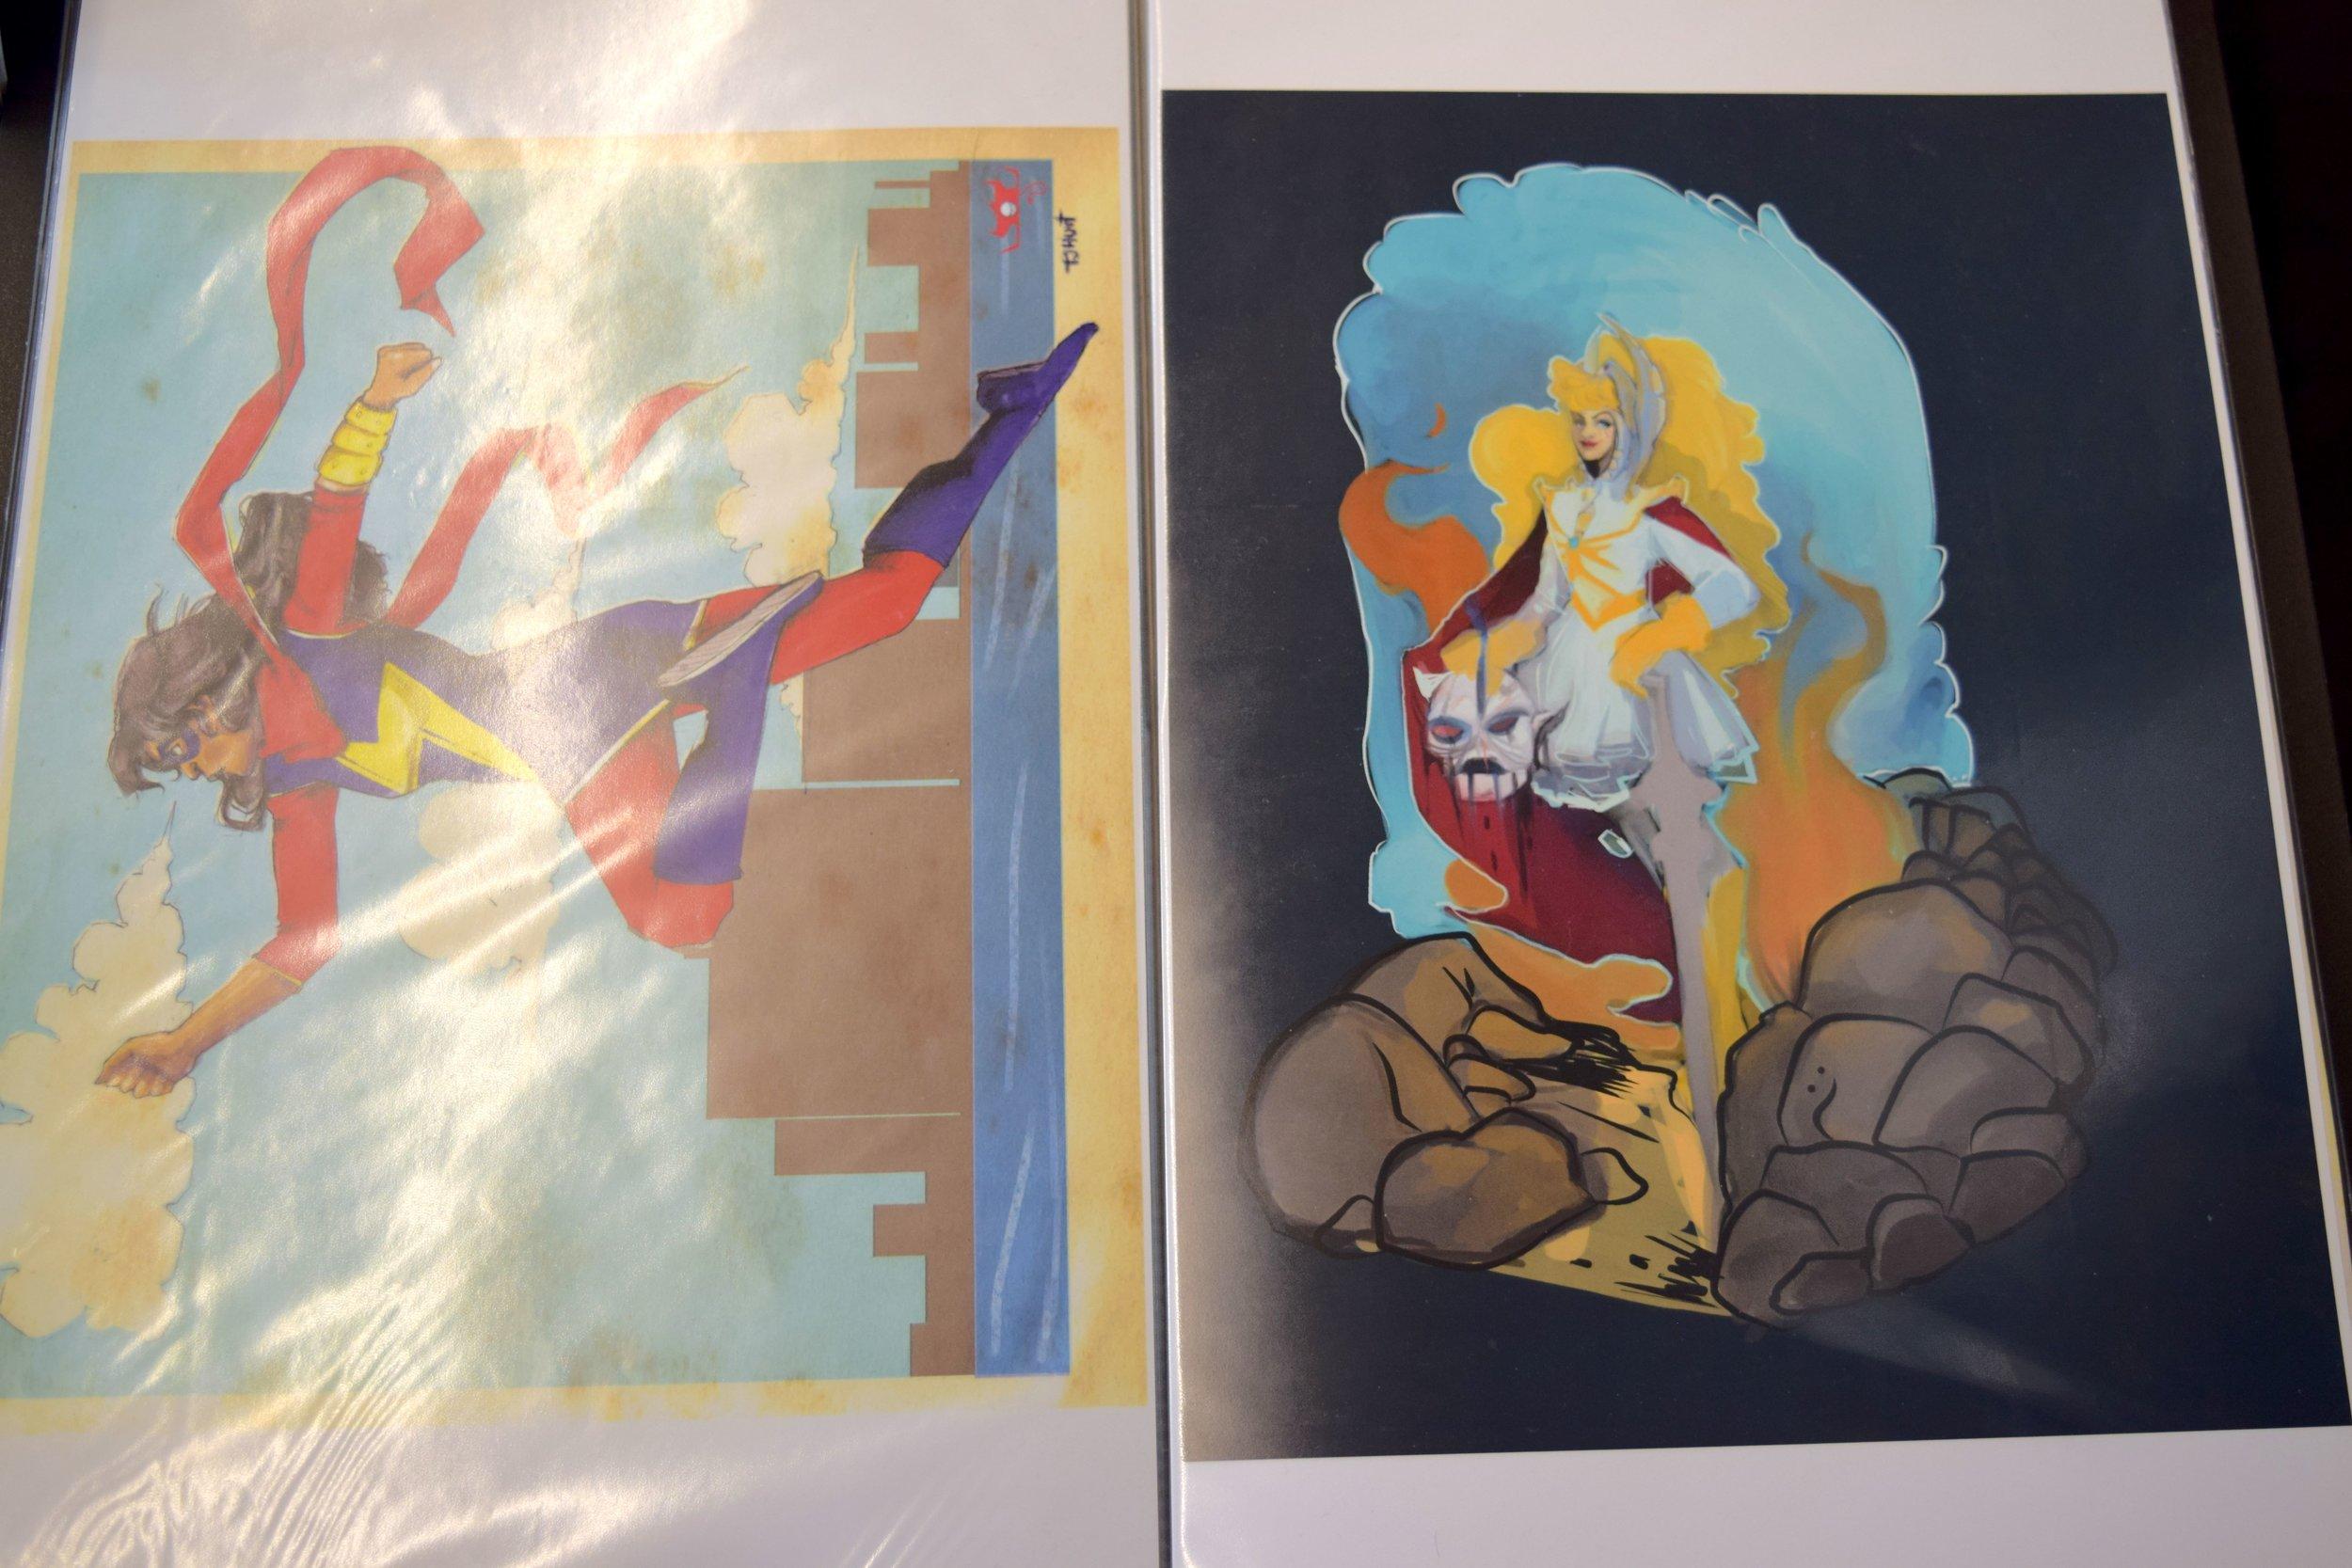 Prints by Thea J. Hunt.